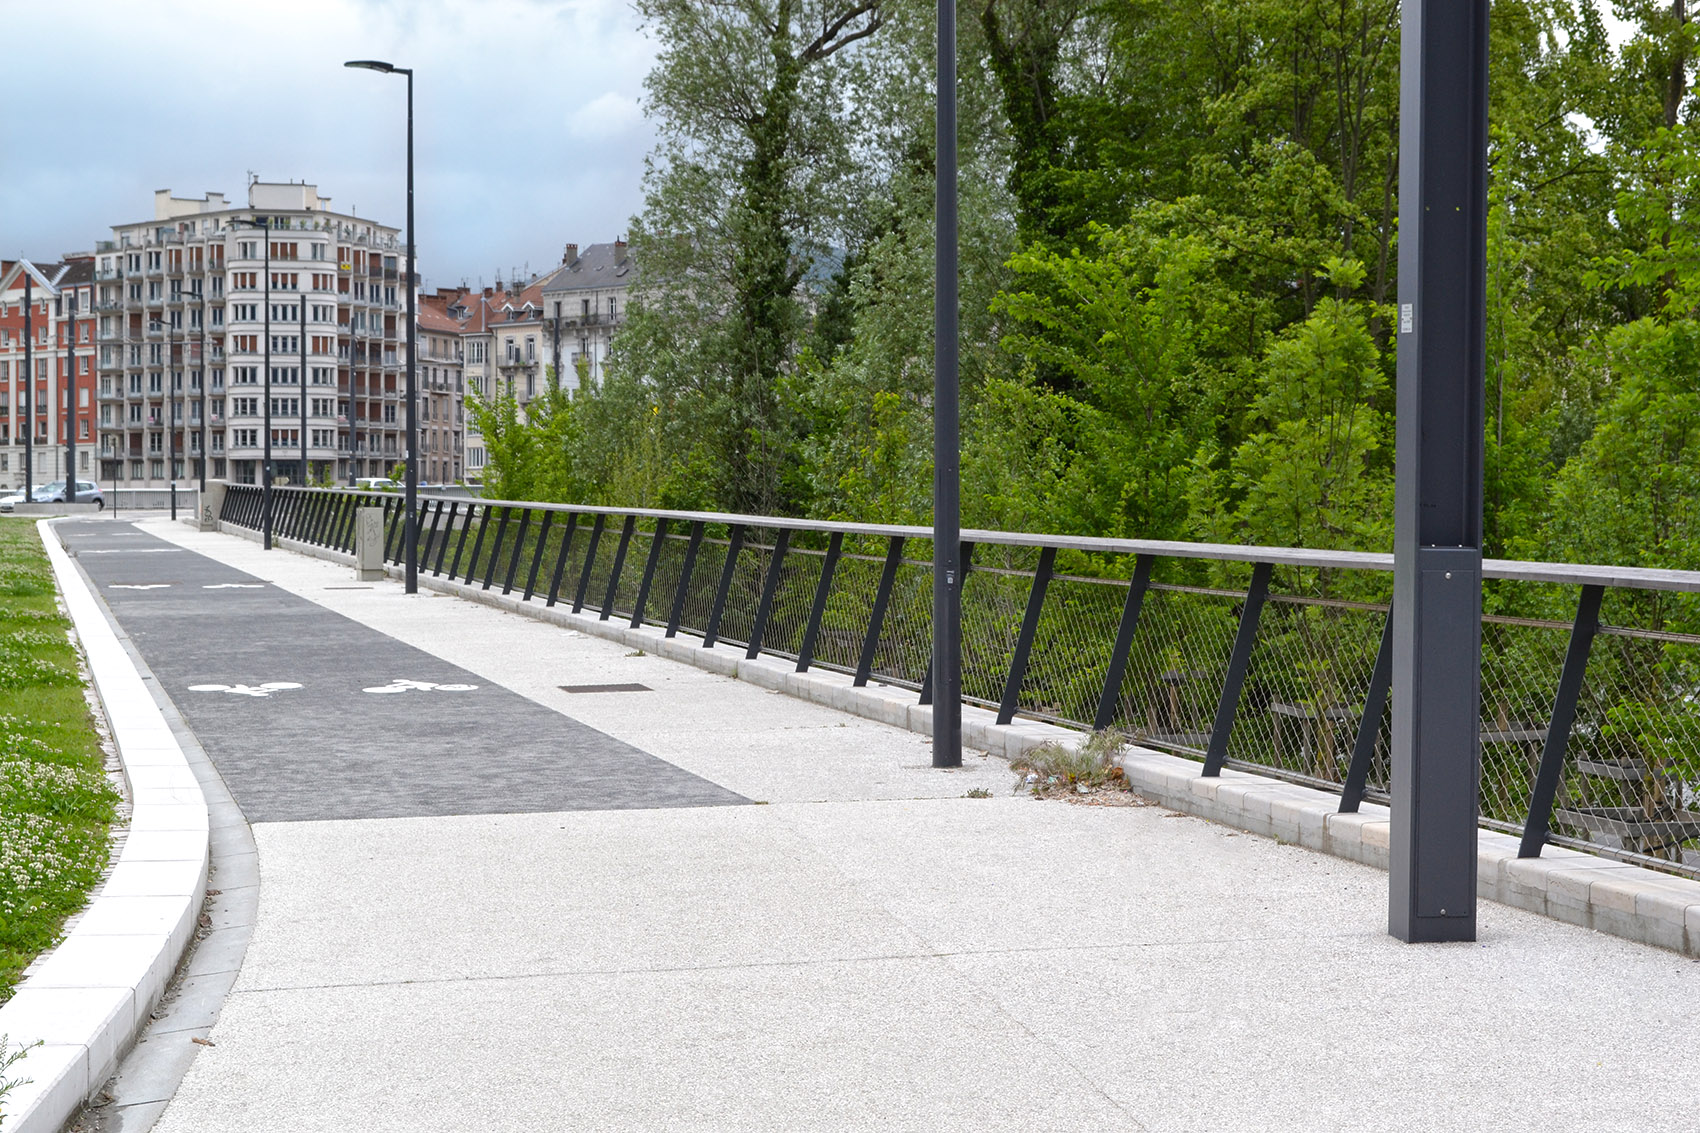 tramway de grenoble urban nt. Black Bedroom Furniture Sets. Home Design Ideas